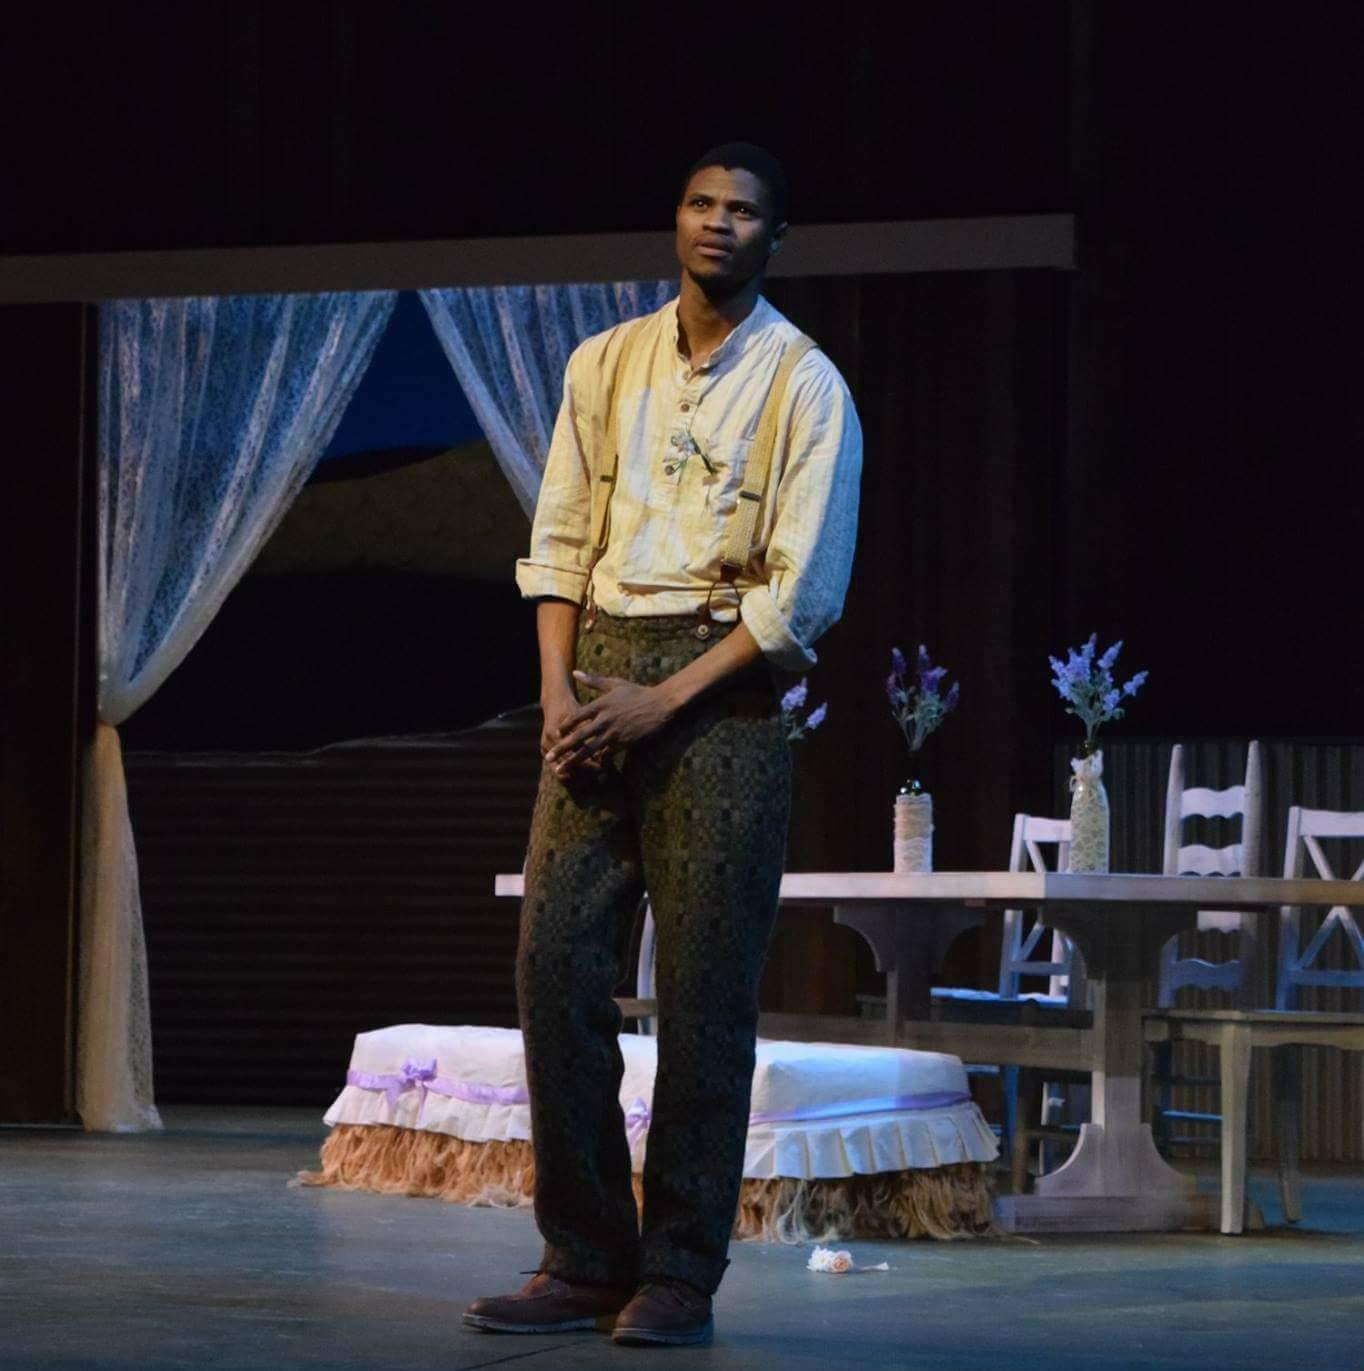 Esewu Nobela - Nemorino in L'ELISIR D'AMORE (Meadows Opera Theater)